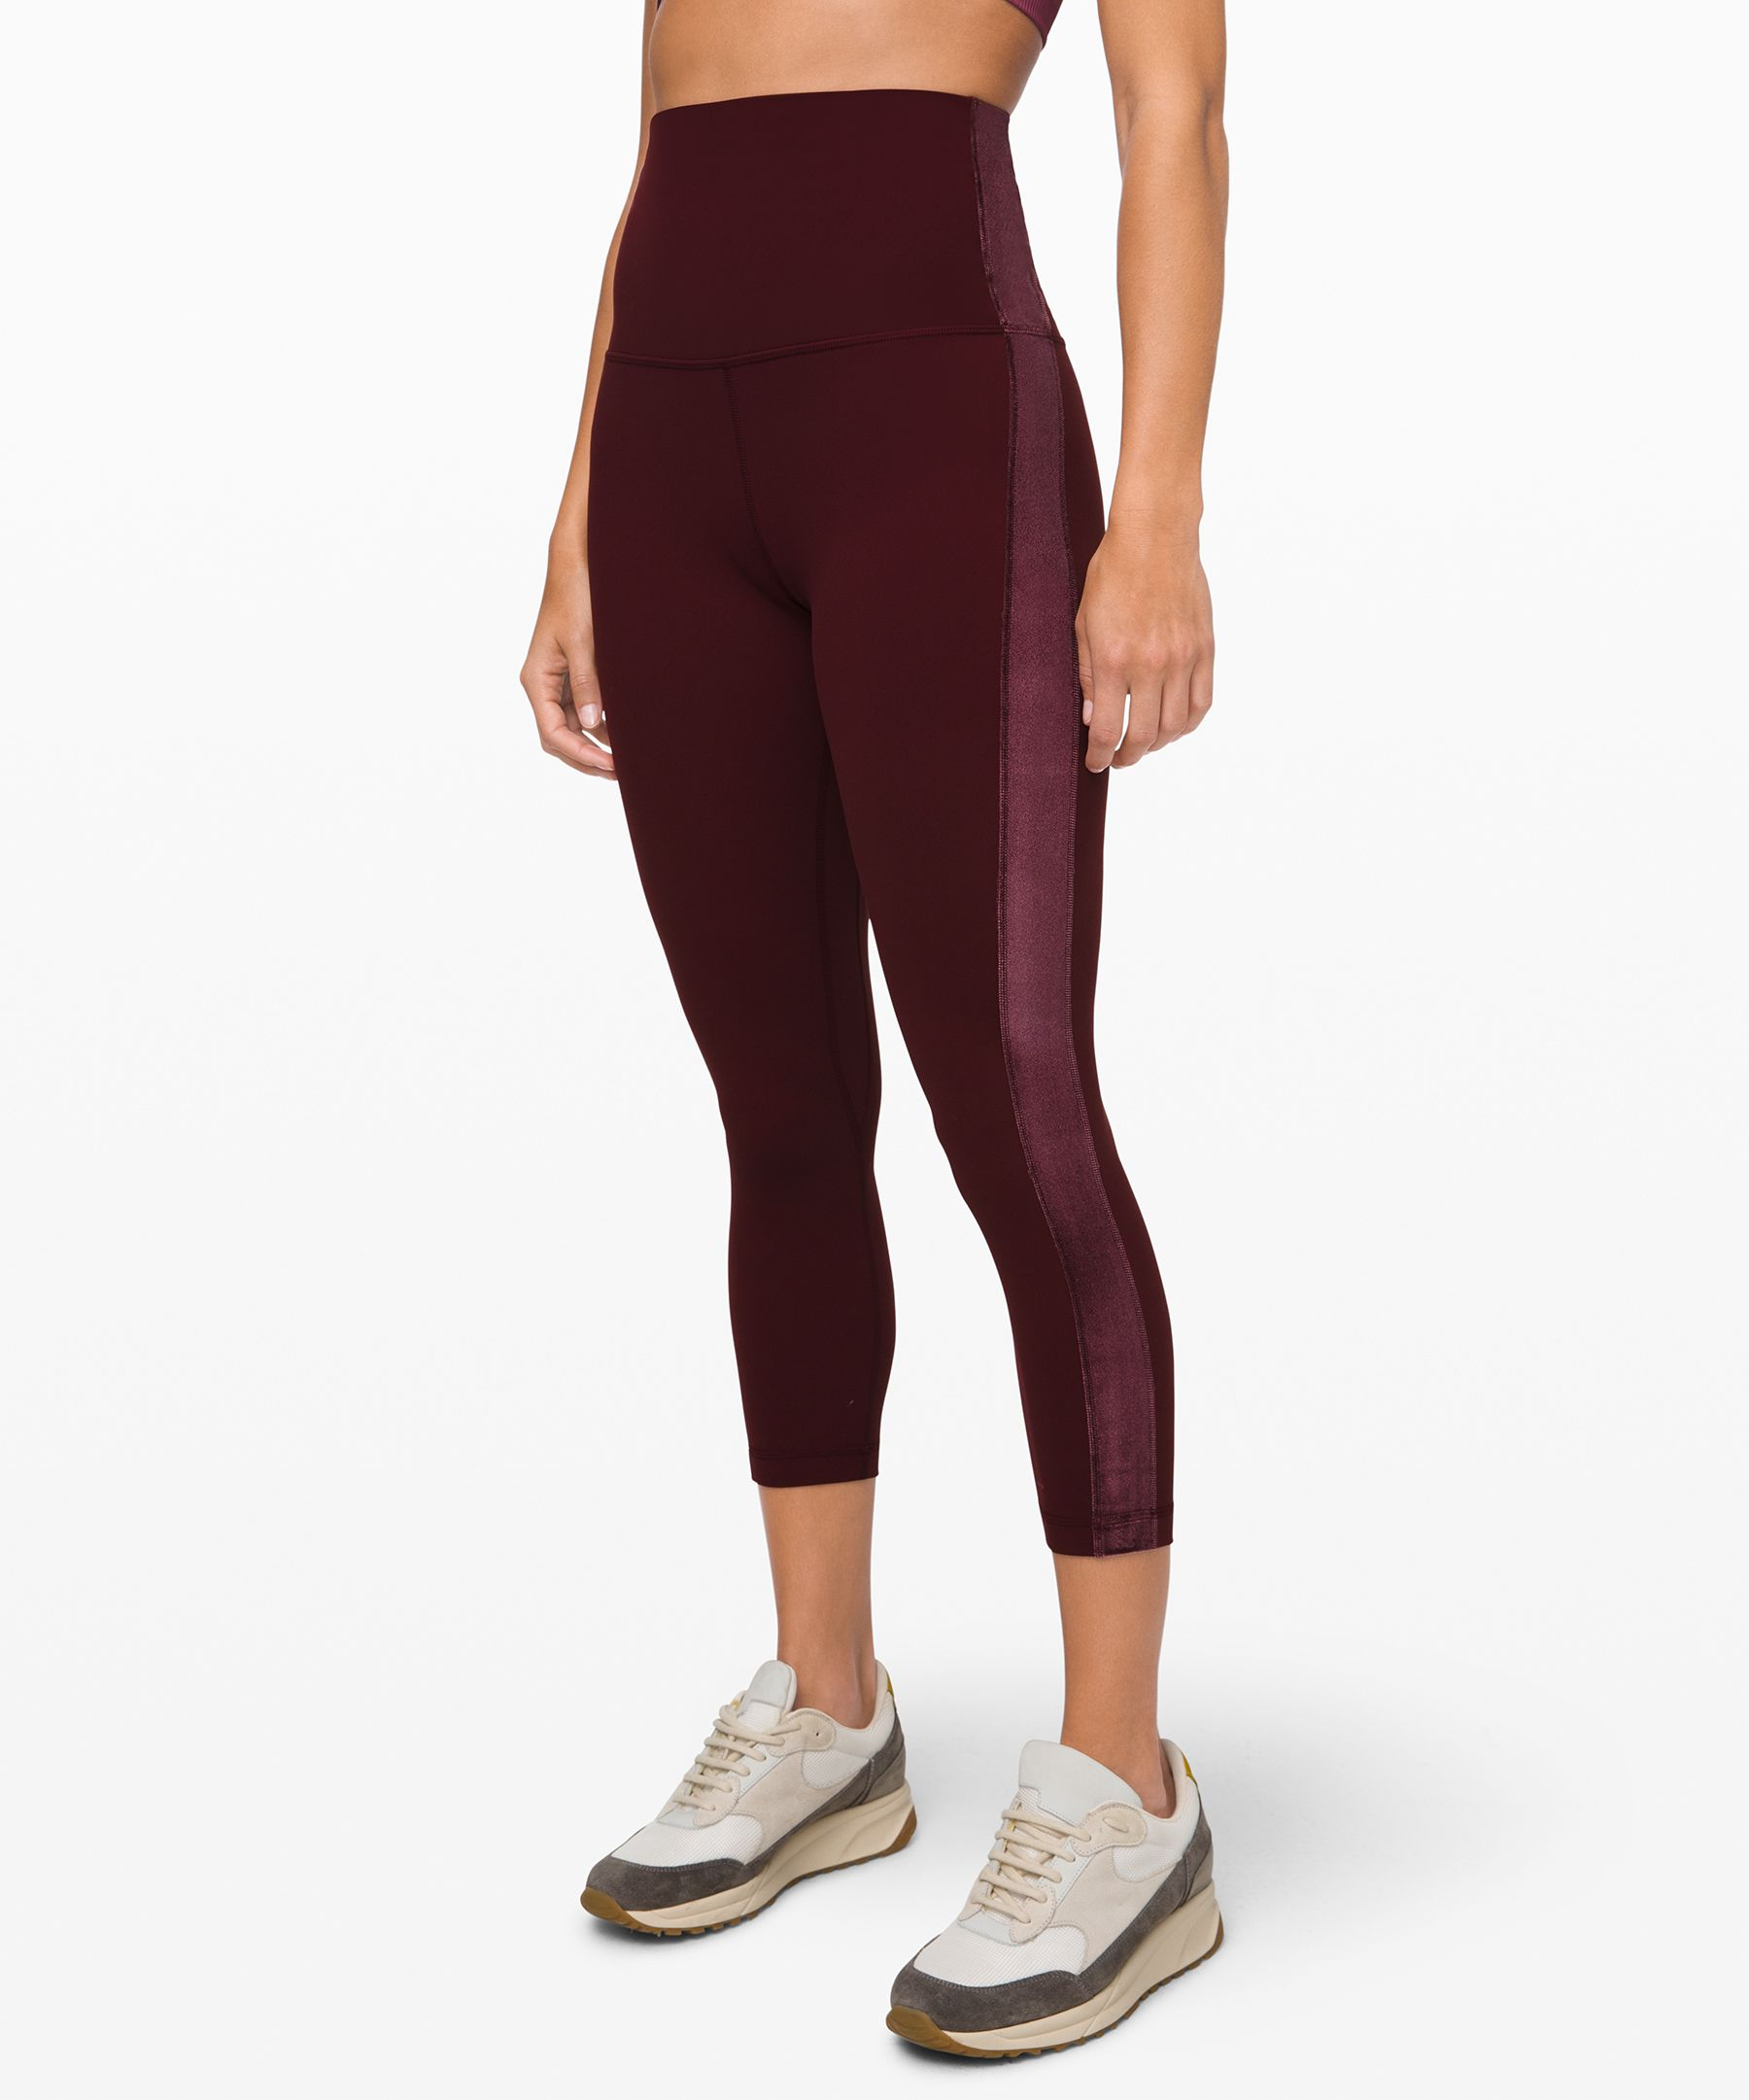 Align Pant Super High-Rise Crop 23 *Velvet